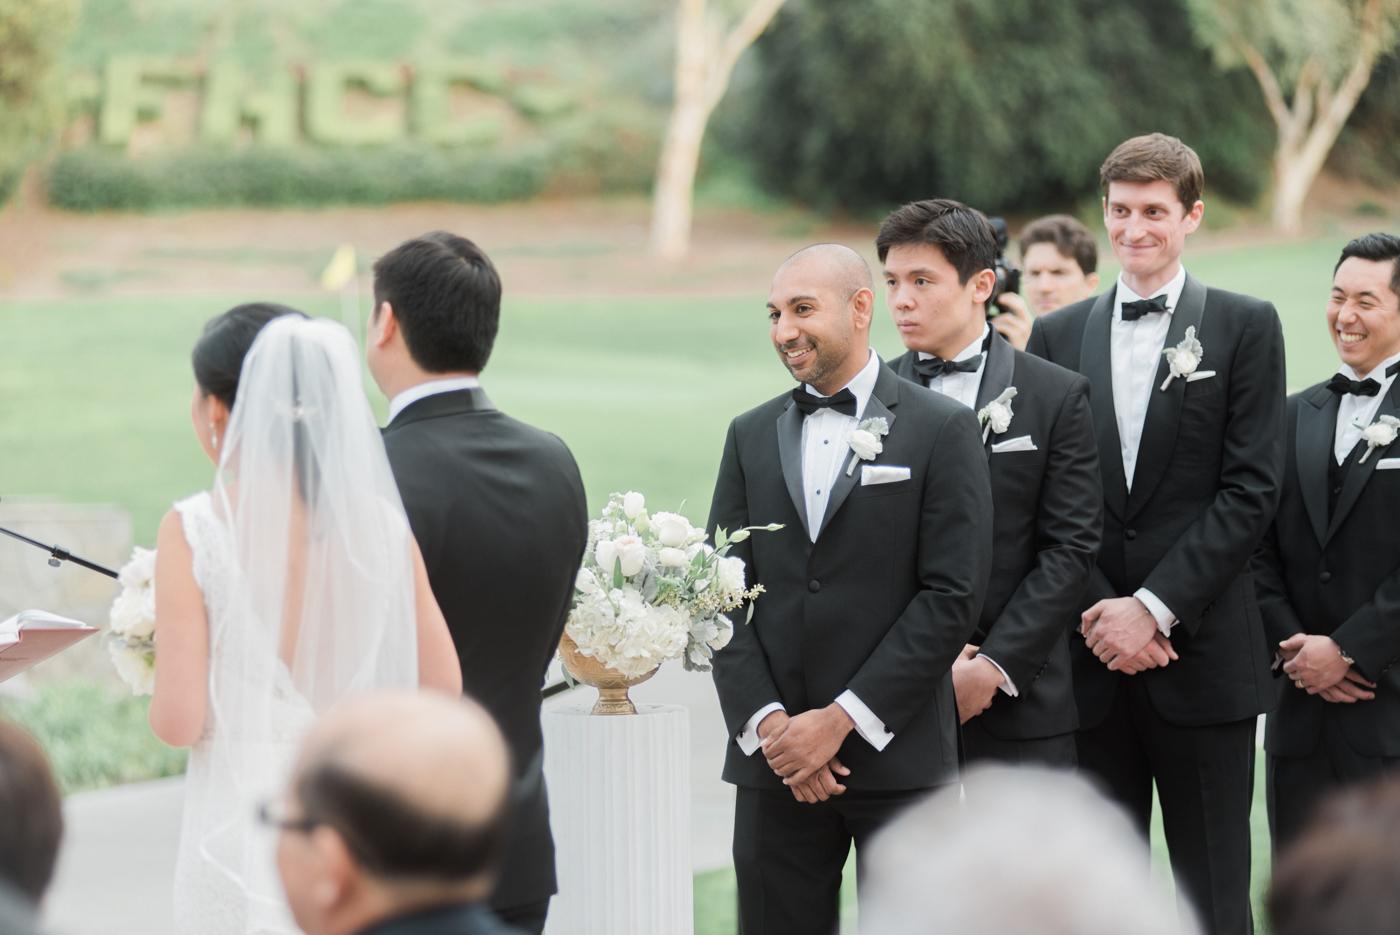 Friendly_Hills_Country_Club_fine_art_wedding_photographer_los_angeles_paris-32.jpg